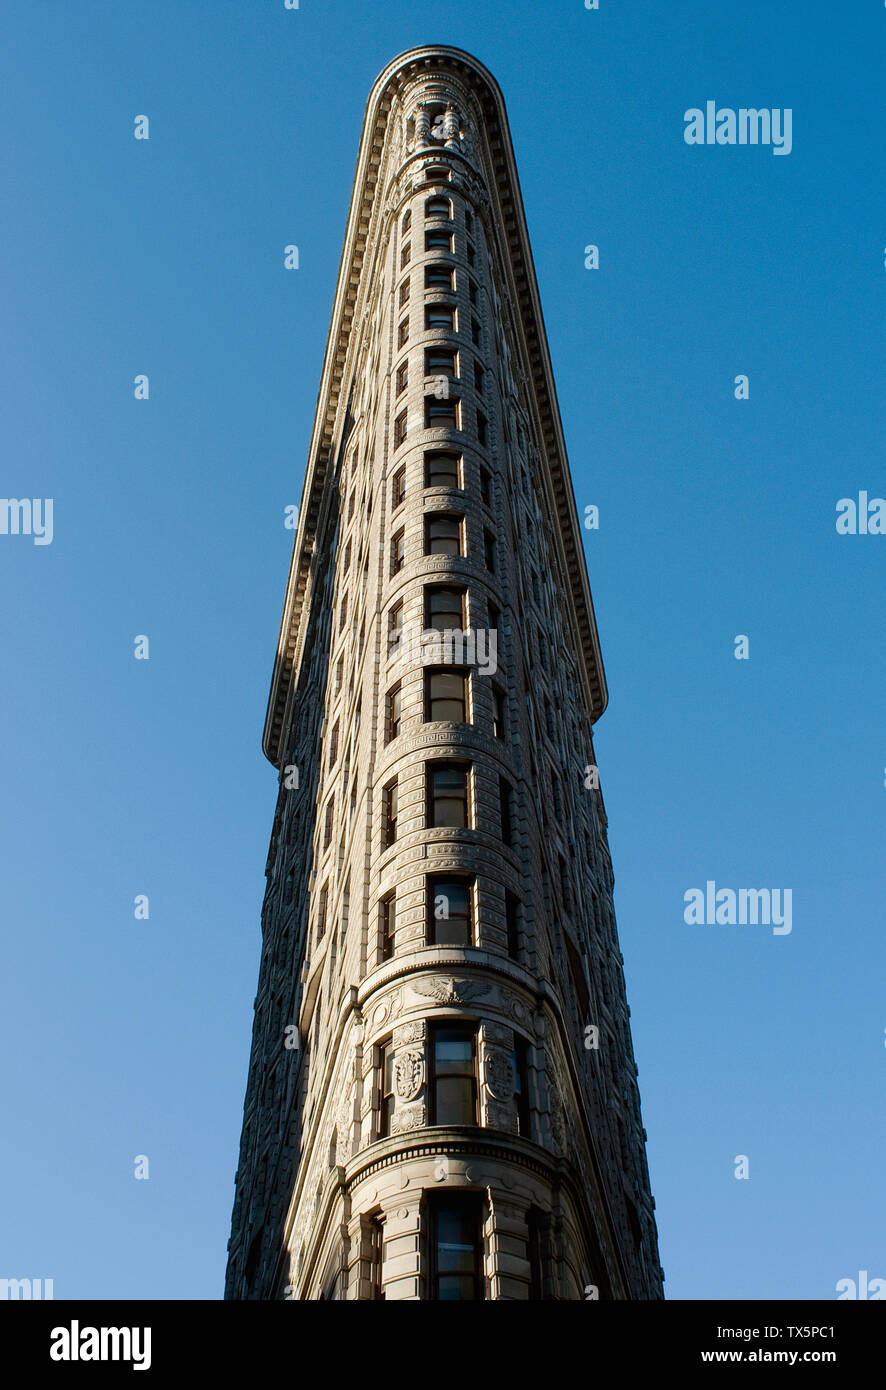 The Flatiron Building in New York City. - Stock Image